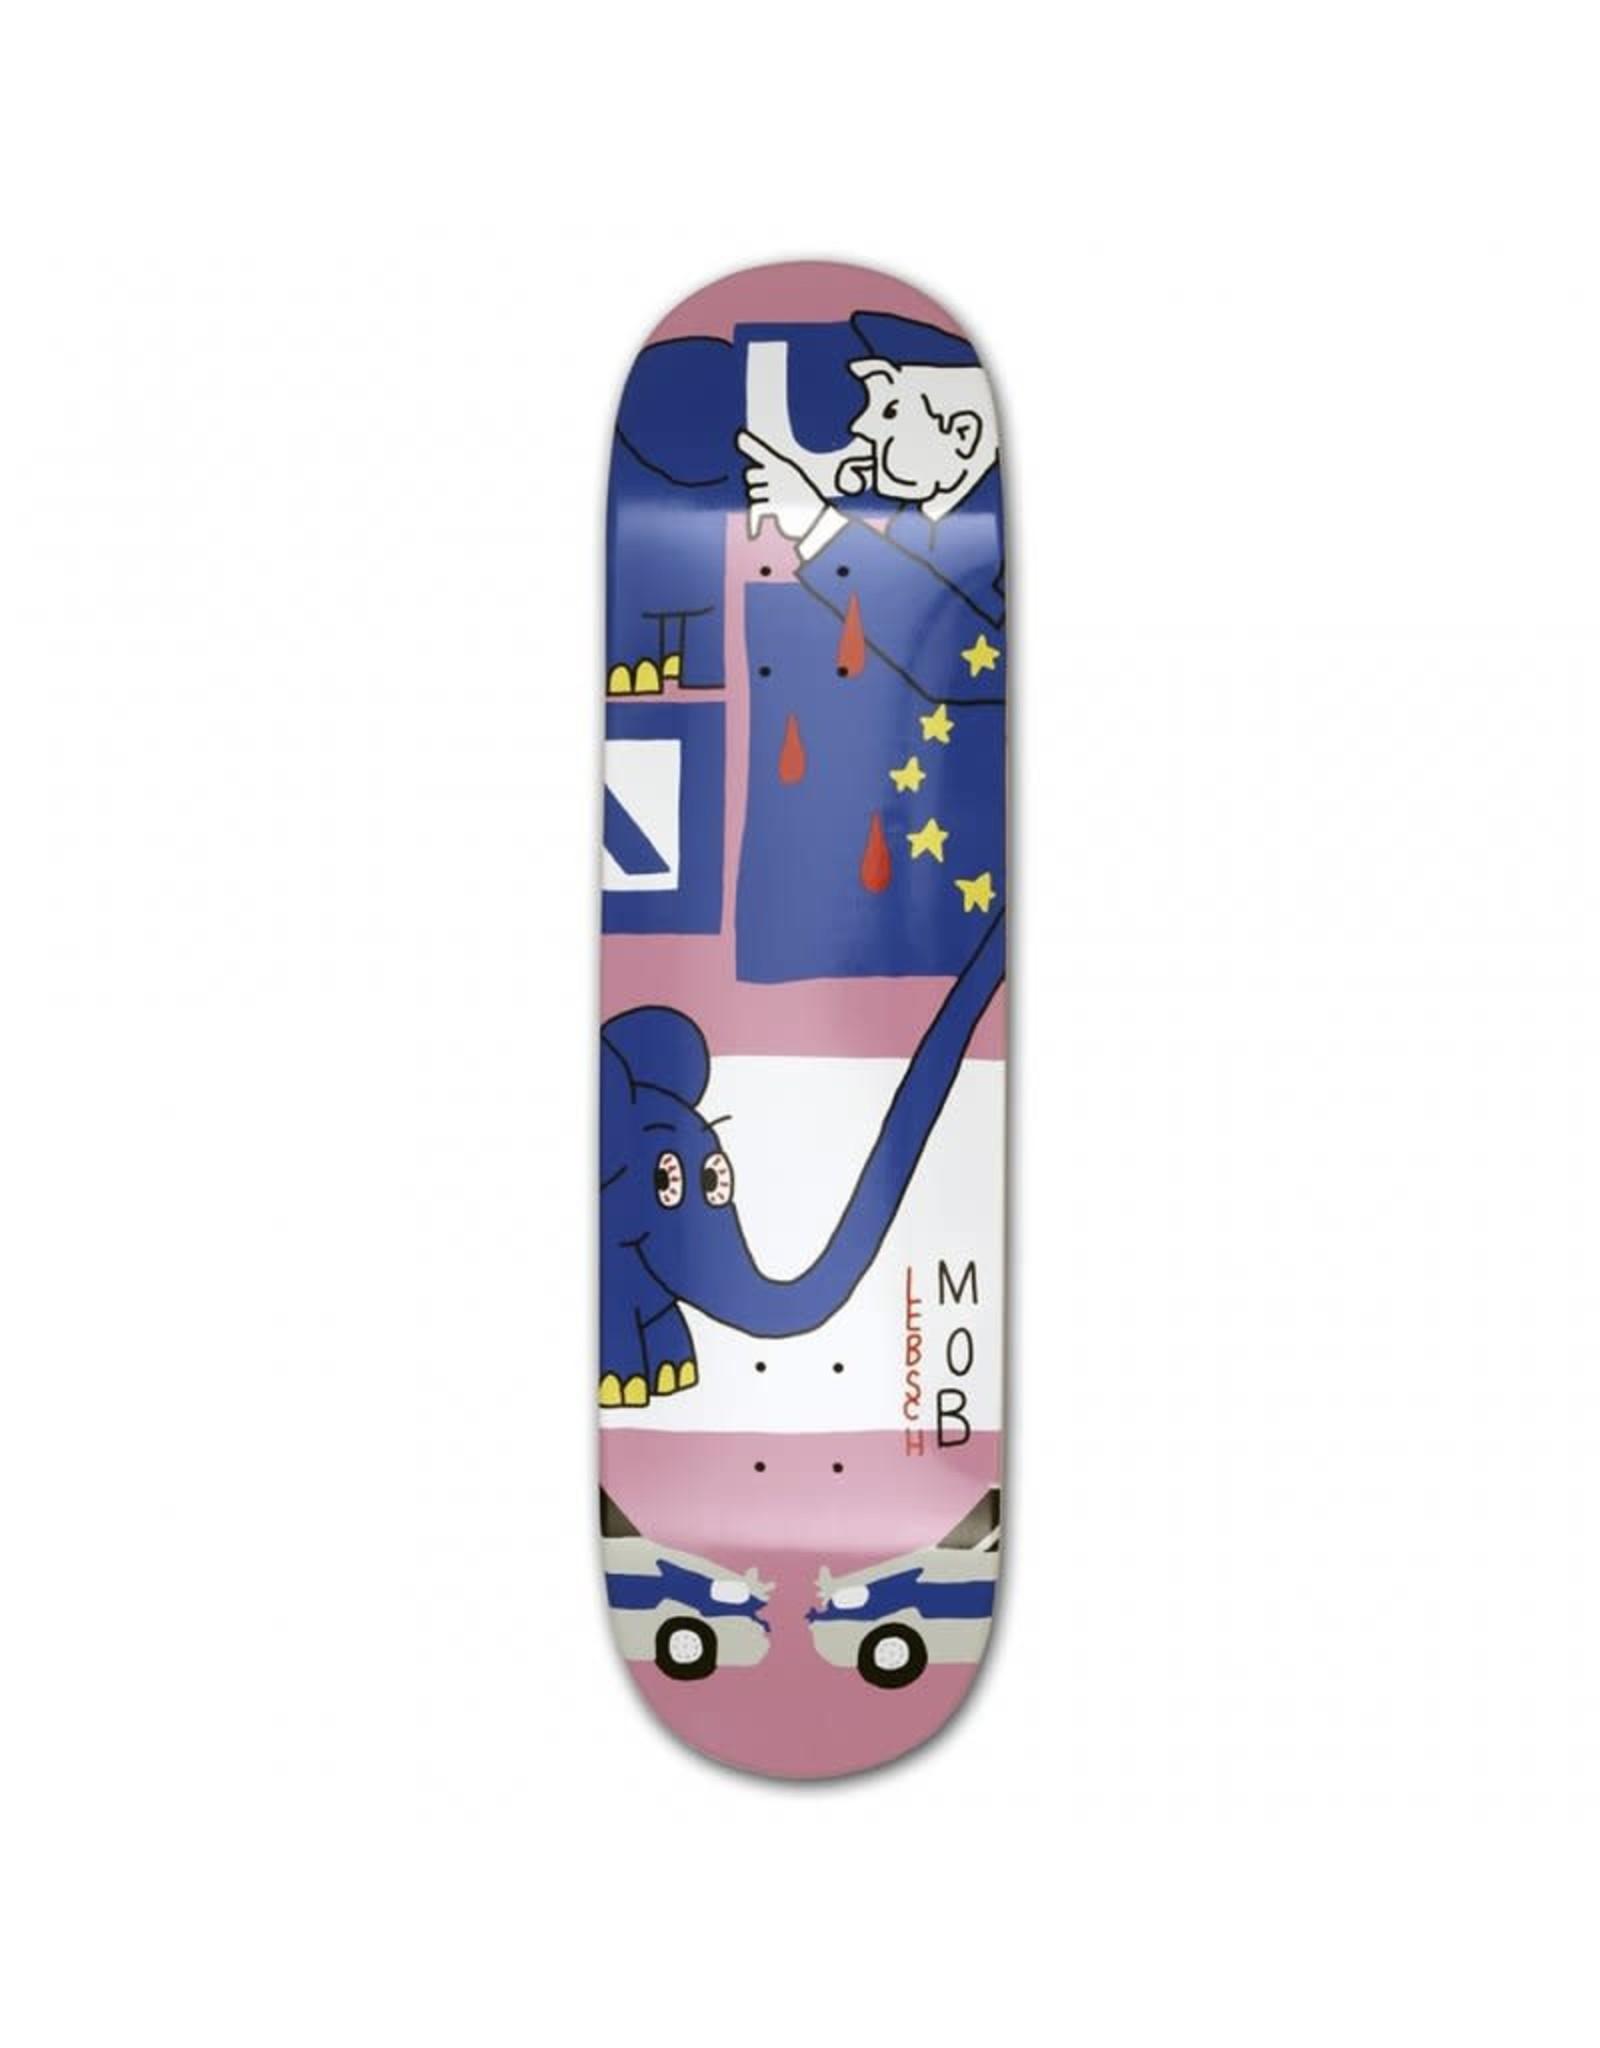 MOB MOB 8.5 Skateboards Elephunk Deck